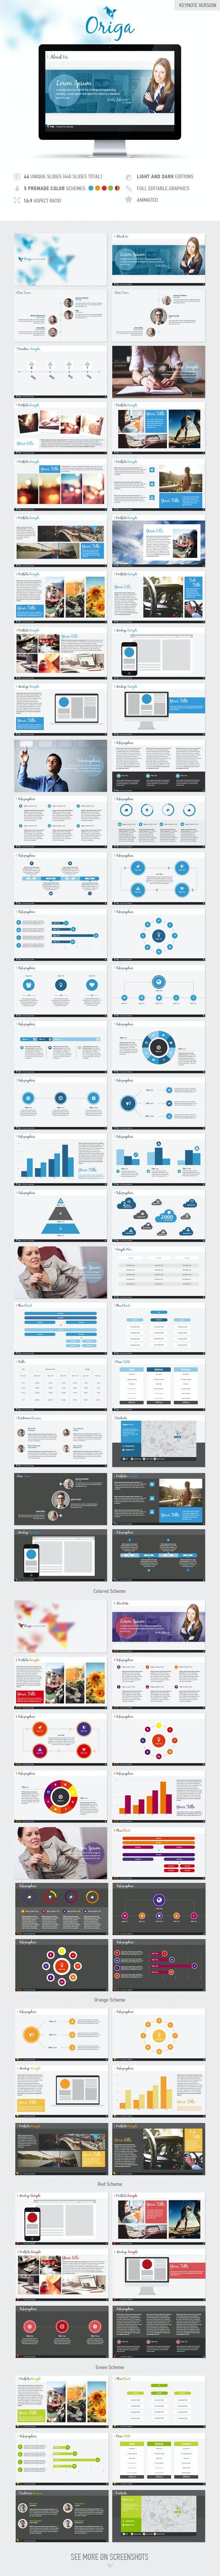 Origa Keynote Presentation Template - Business Keynote Templates